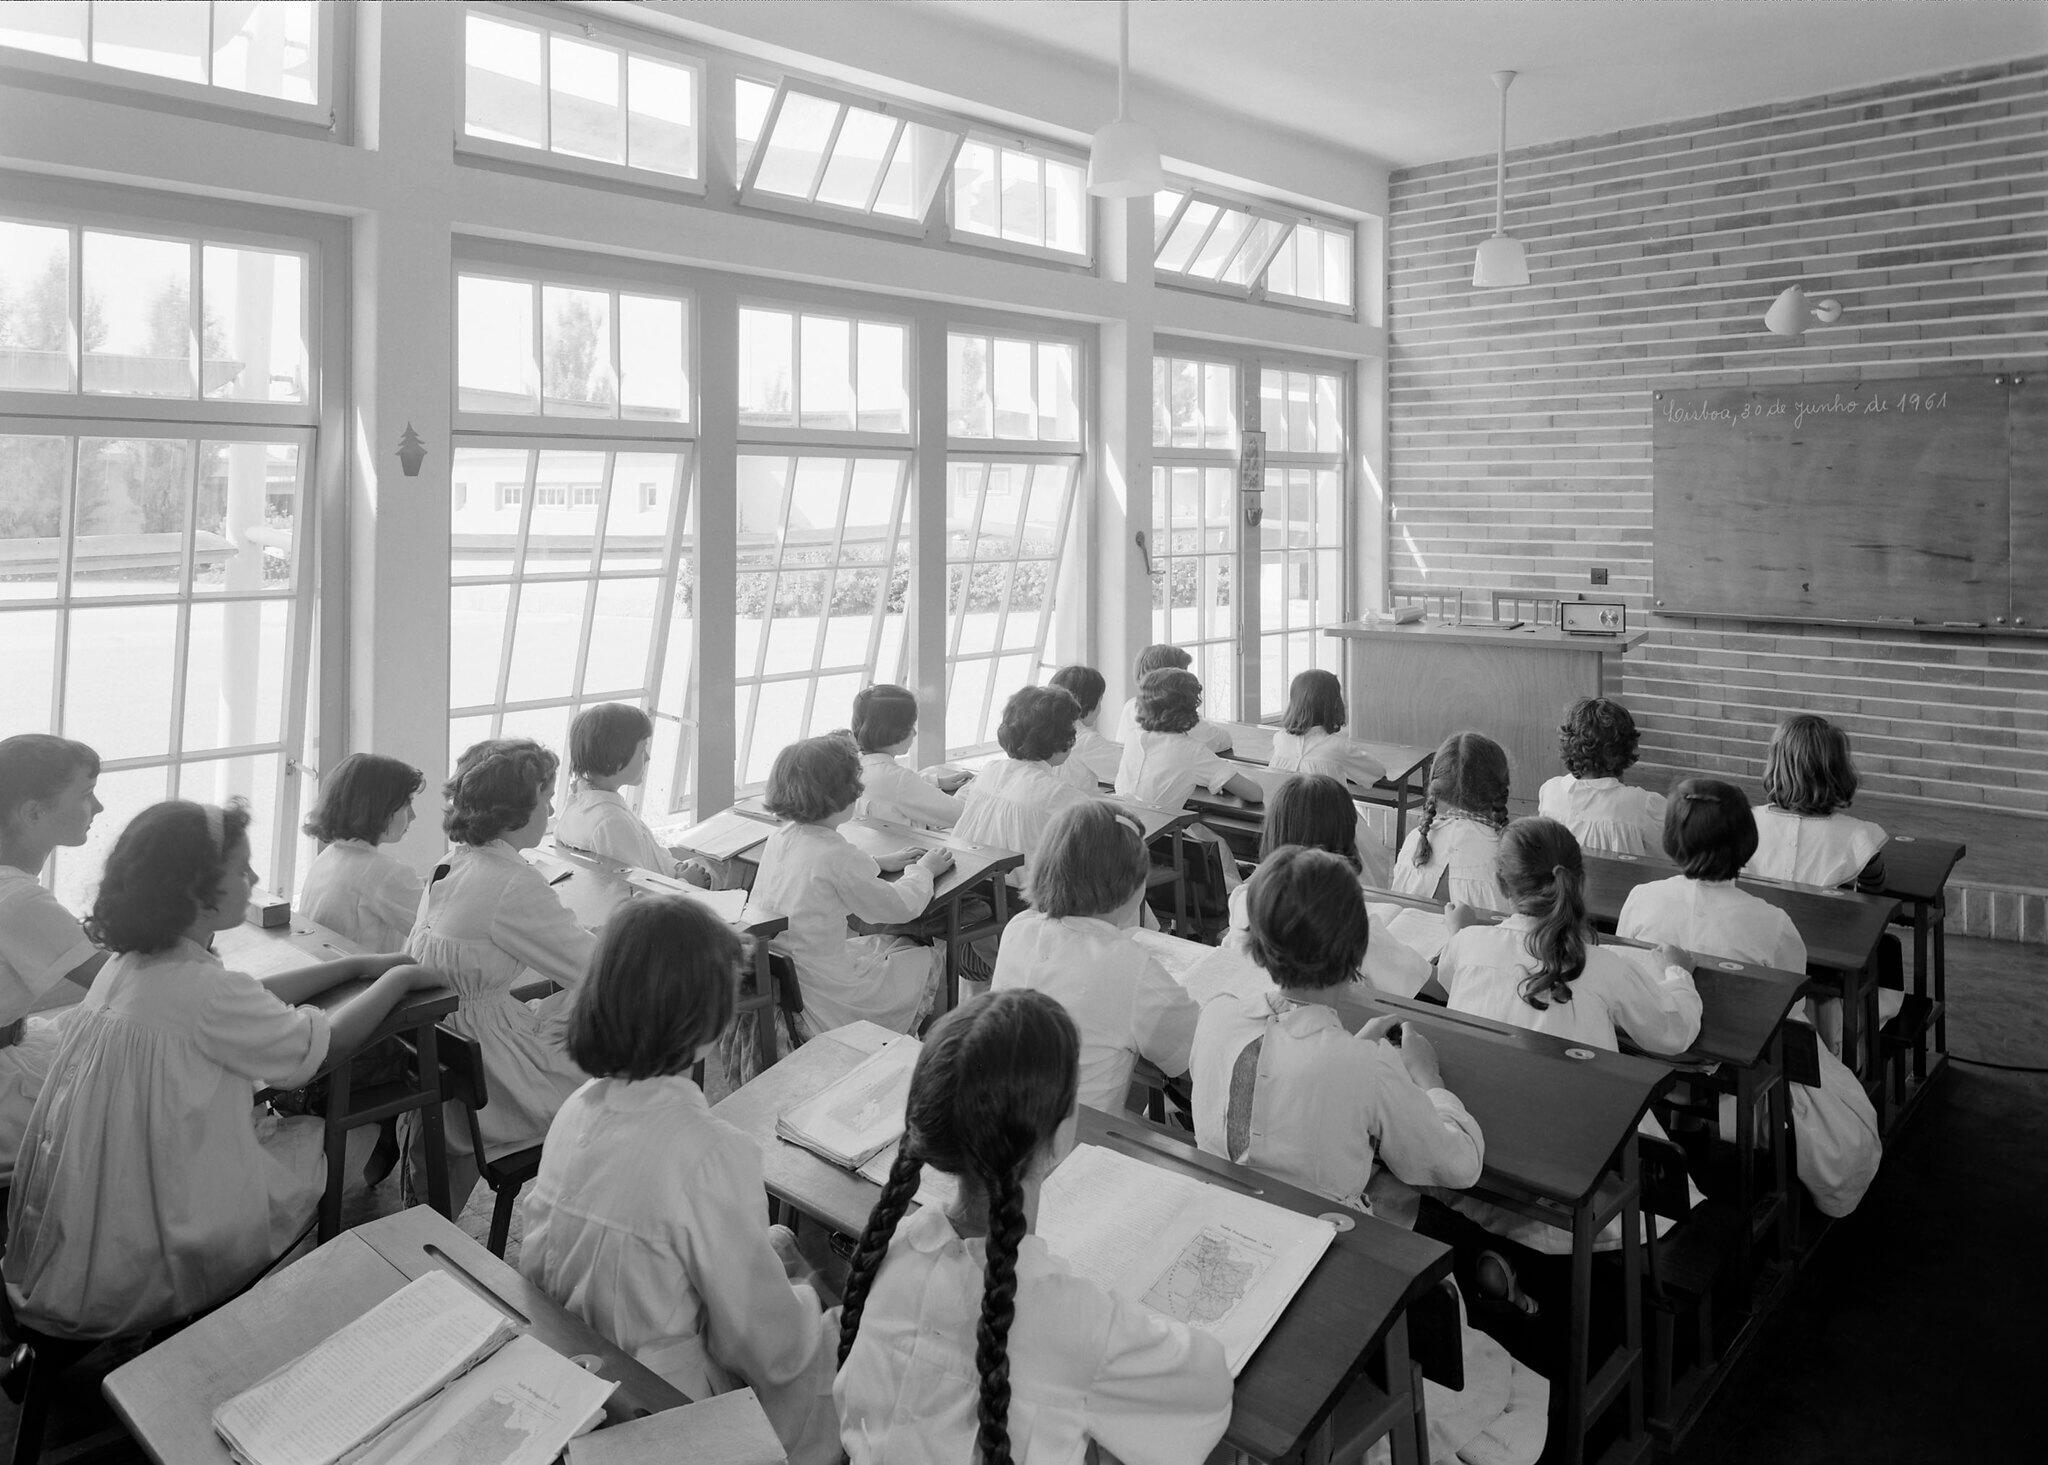 Escola Primária antiga, Lisboa, 1961